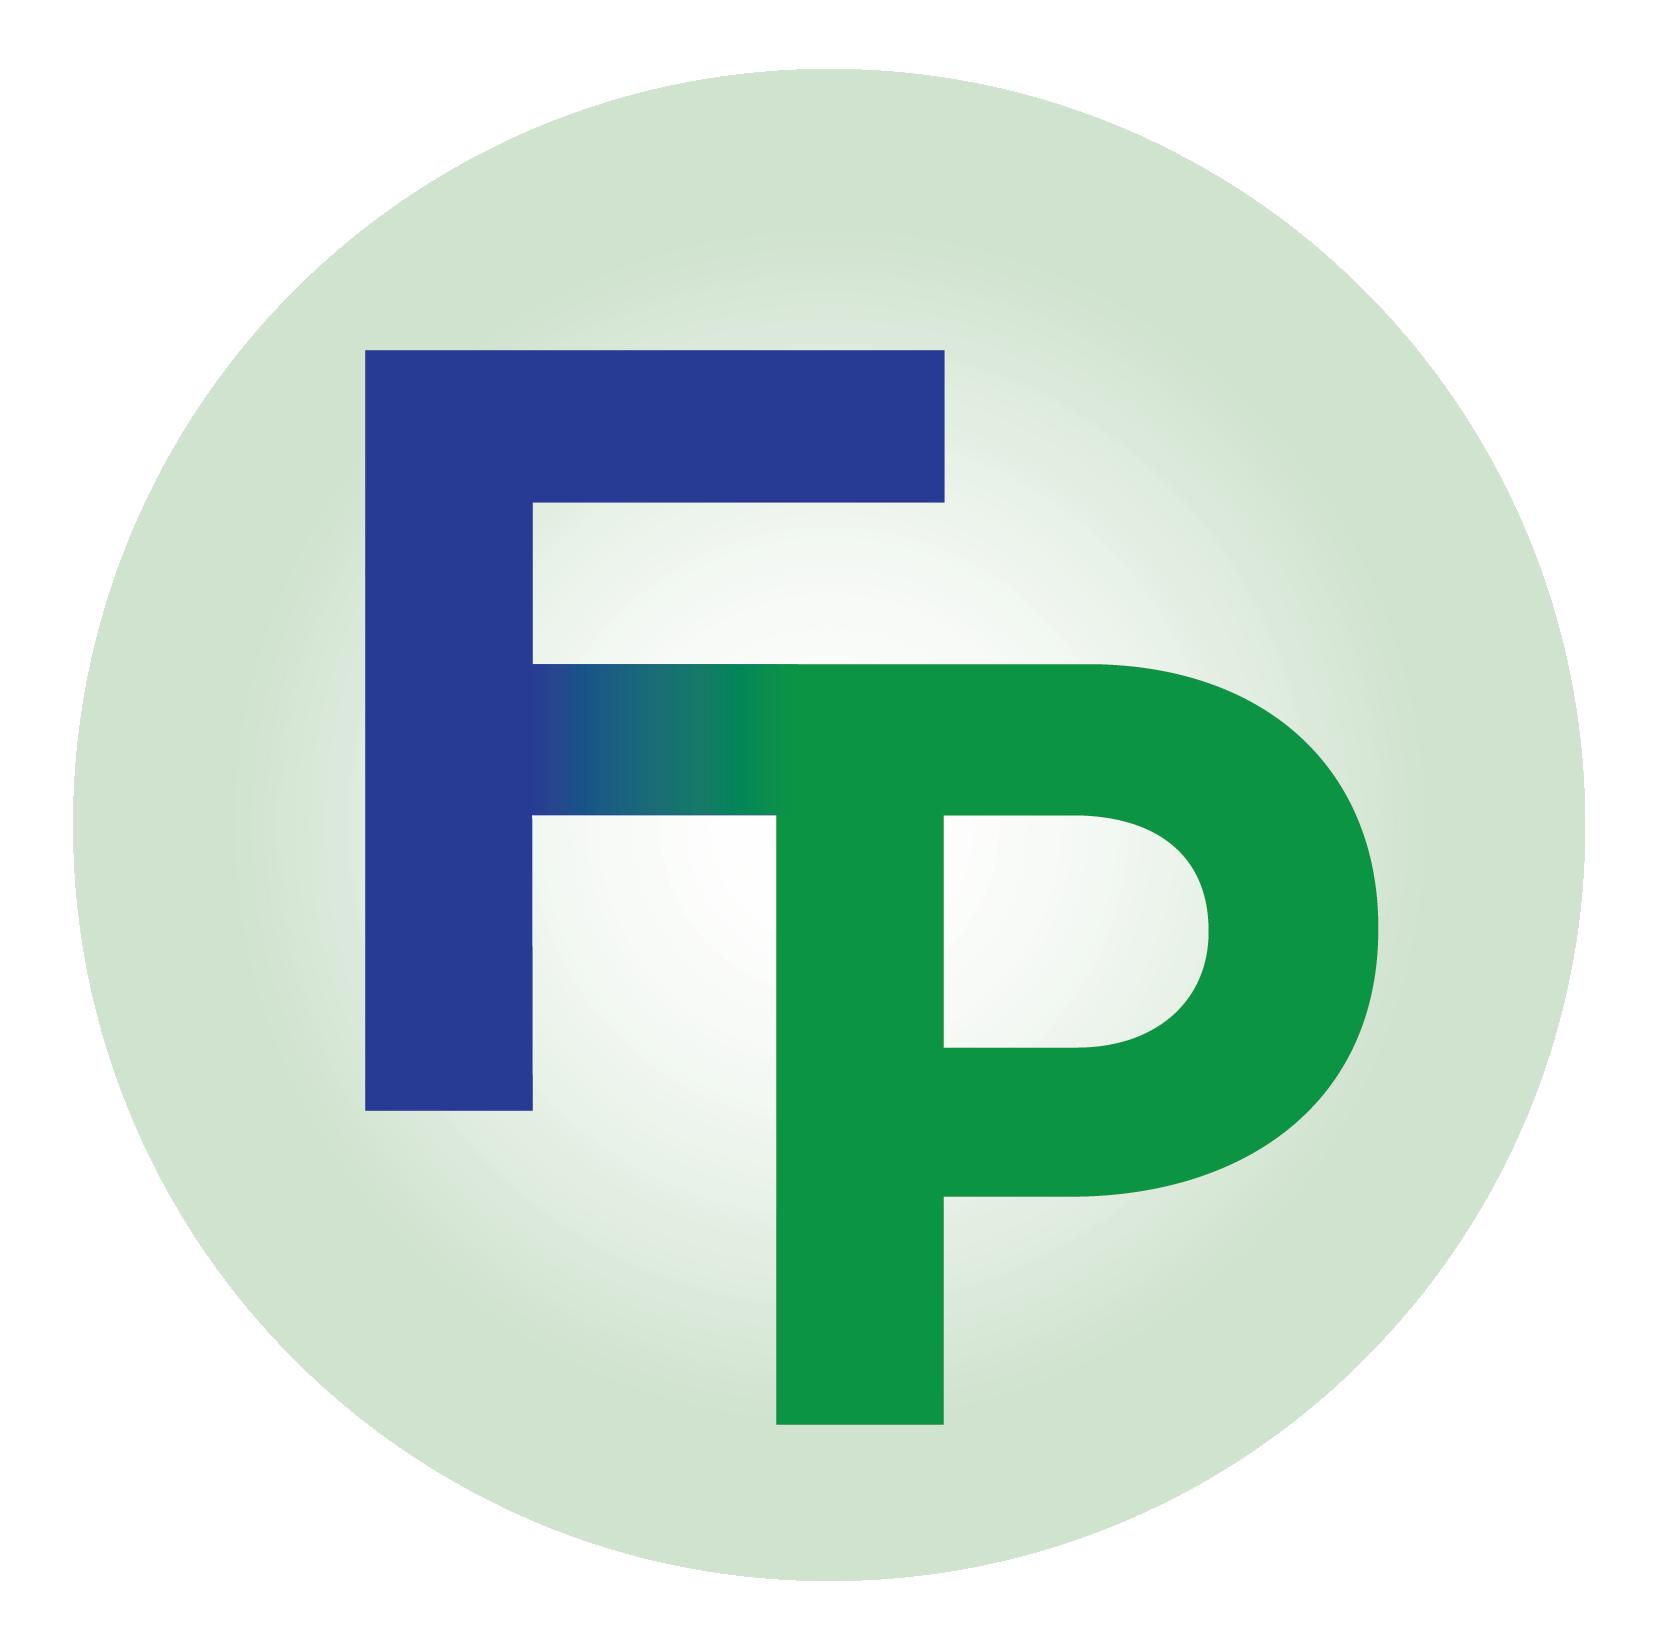 fitnessplans.ca personal training program online